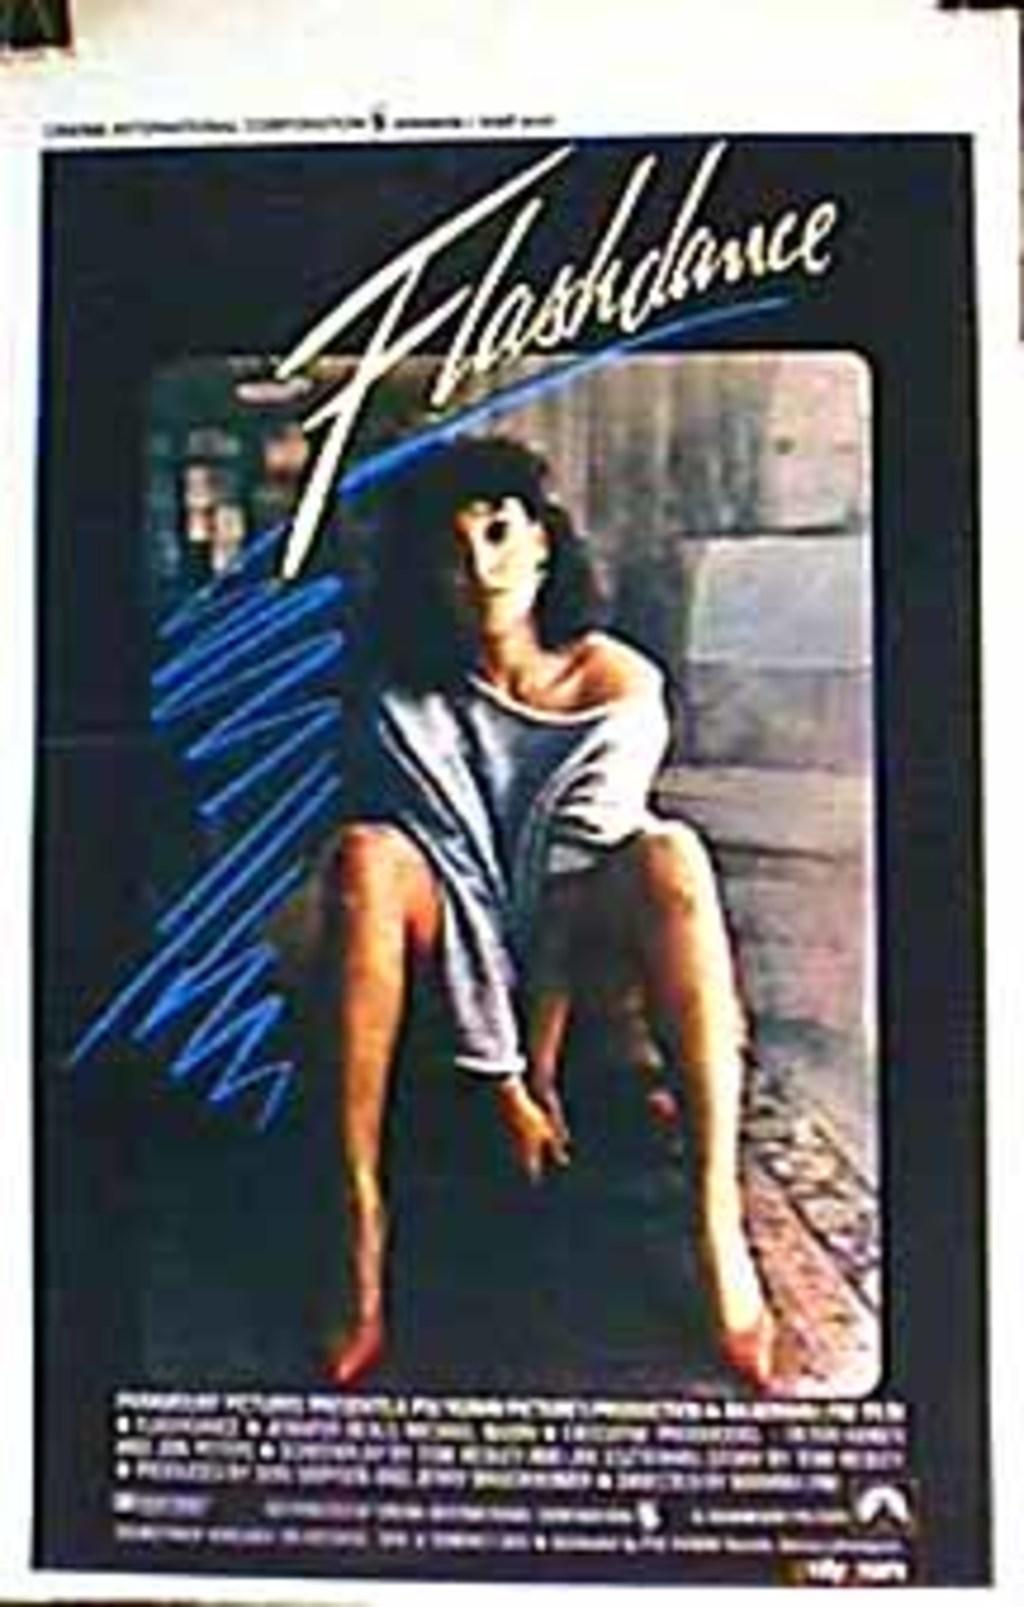 Flashdance 1983